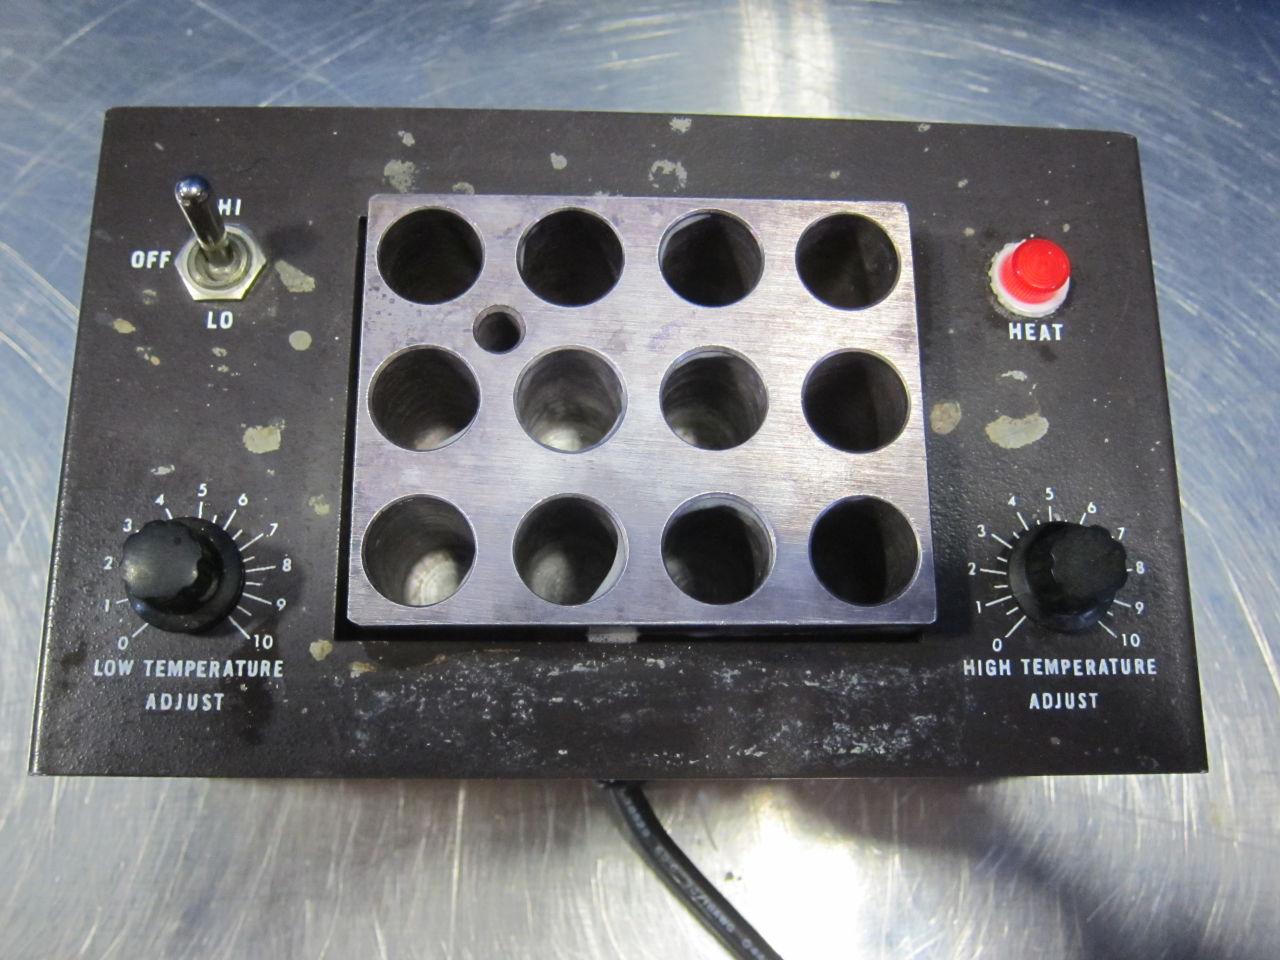 LAB-LINE INSTRUMENTS Temp-Blok Module Heater